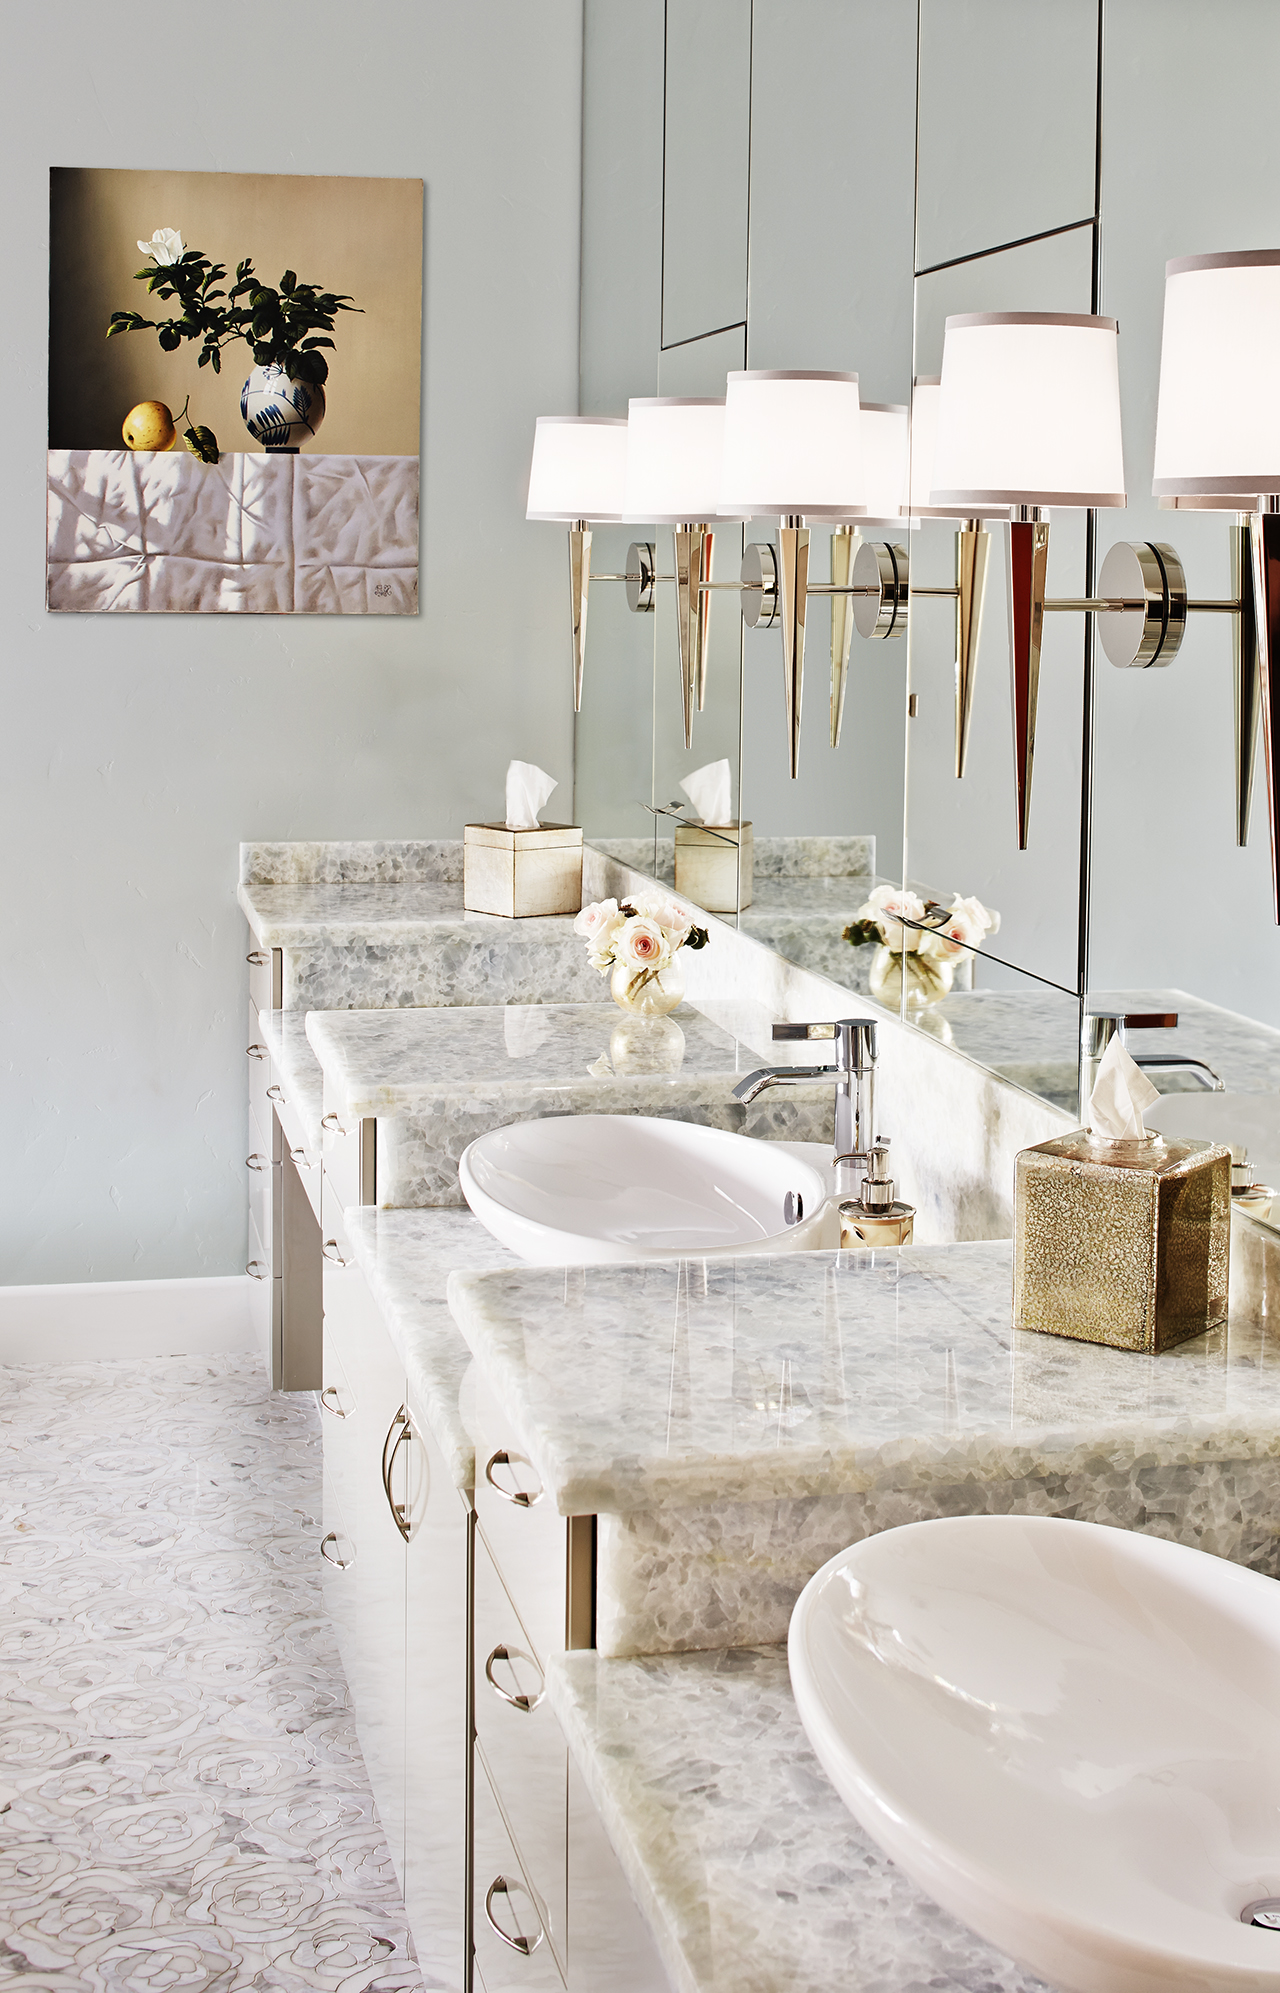 Artistic Tile Bathrooms by Staprans Design